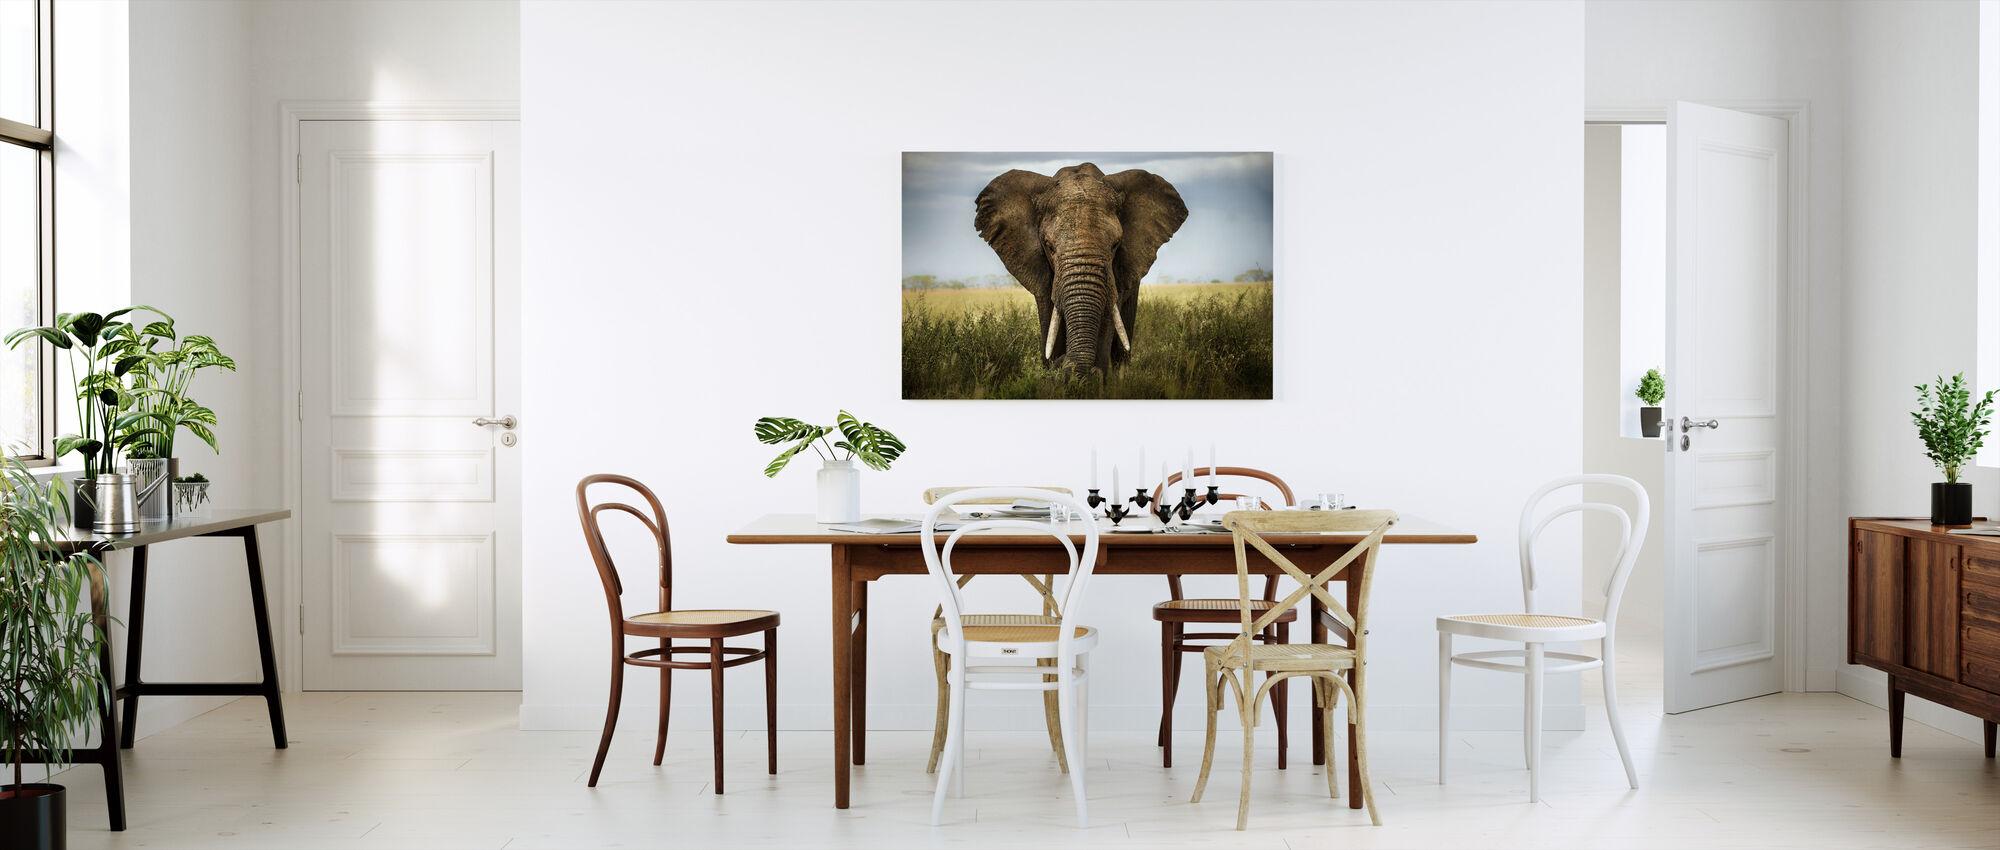 Olifantenscène - Canvas print - Keuken